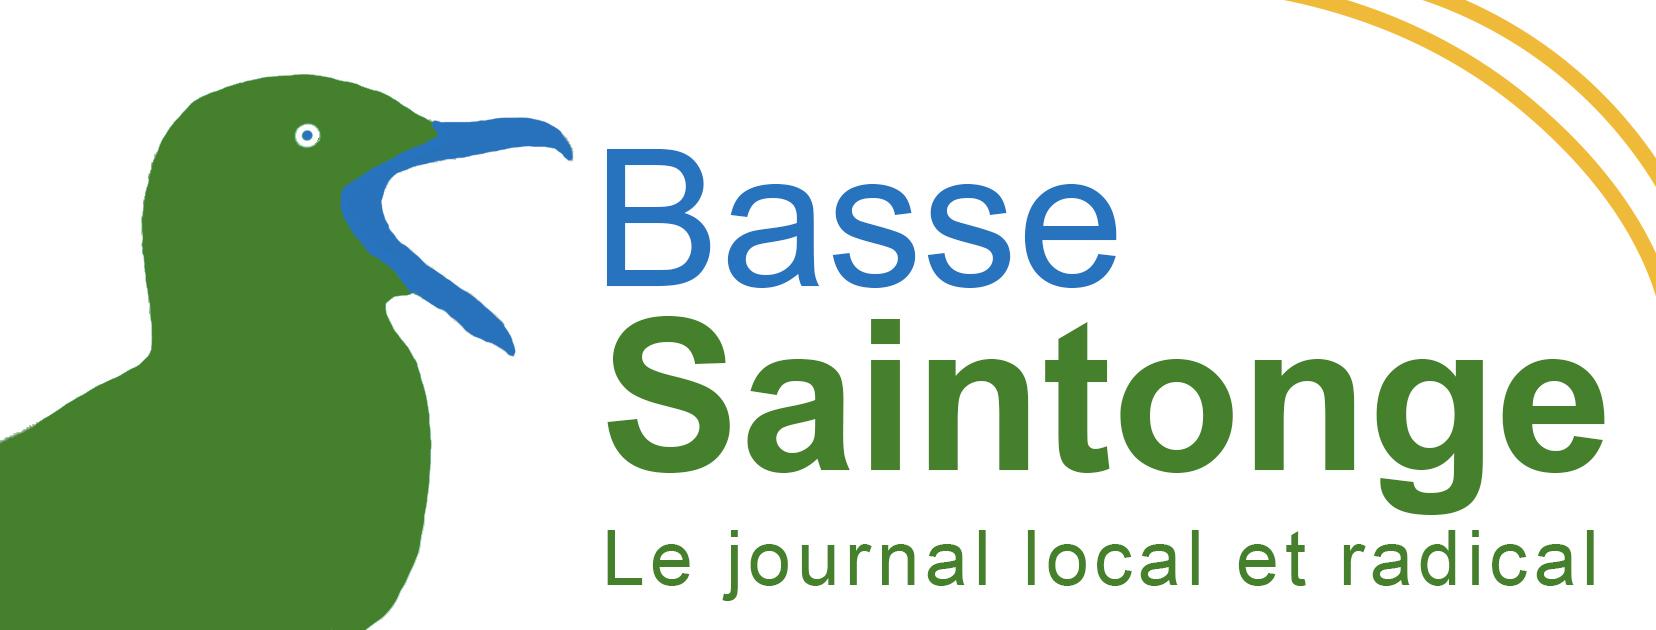 Basse Saintonge